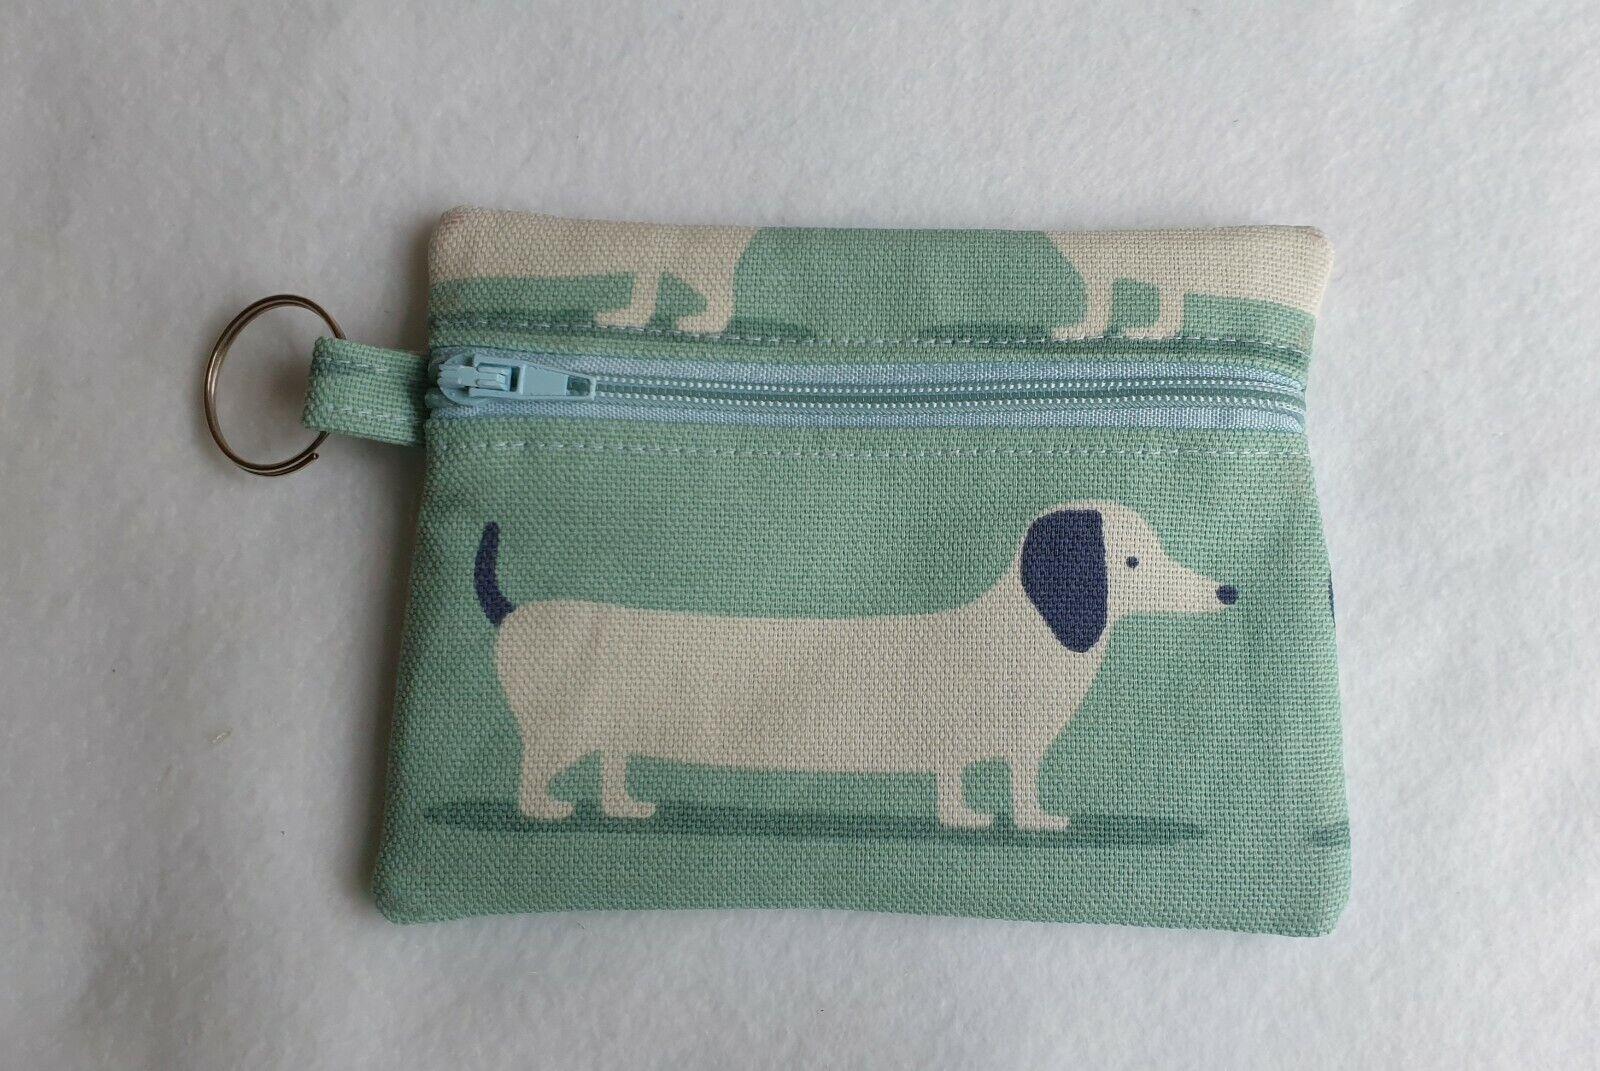 Sausage Dog Discrete modesty purse pouch Sanitary Case Bag Holder Pads Cards